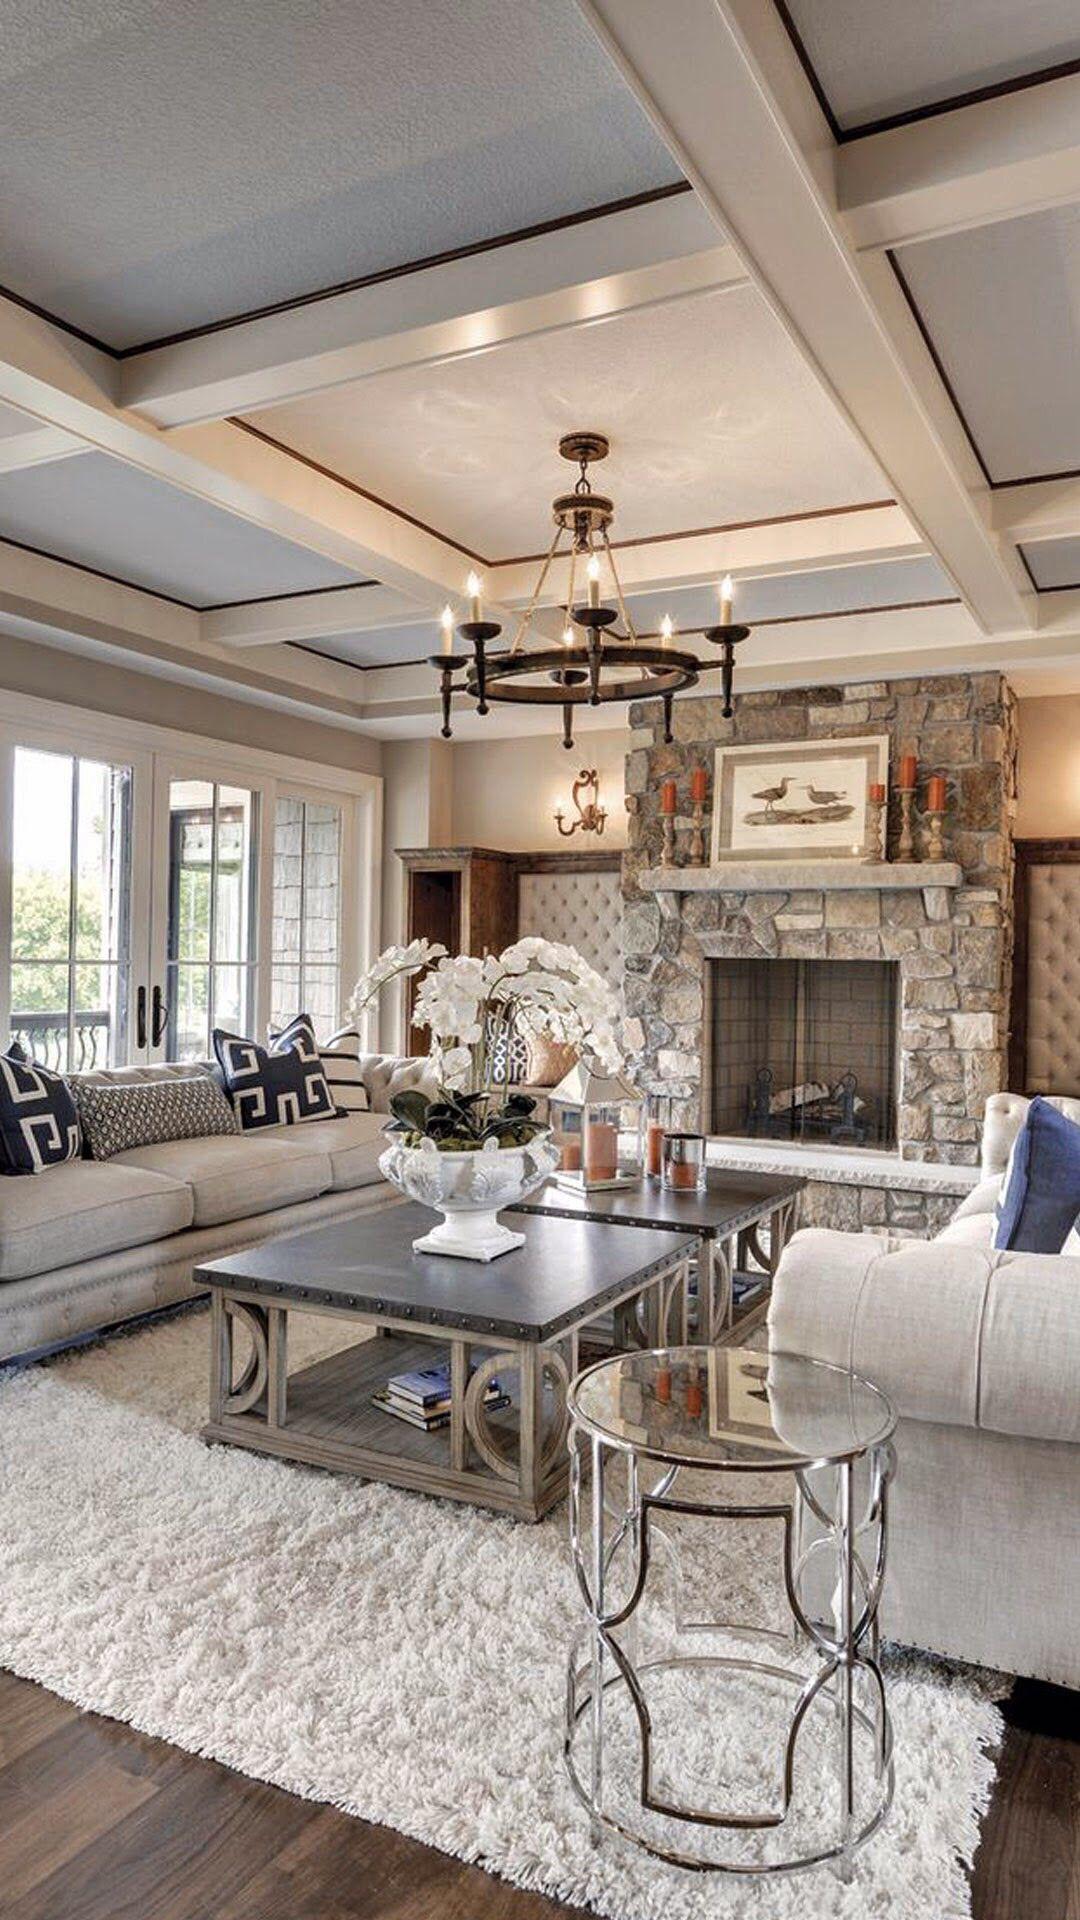 Luxury Interior Luxurydotcom Design Ideas Via Houzz Rustic